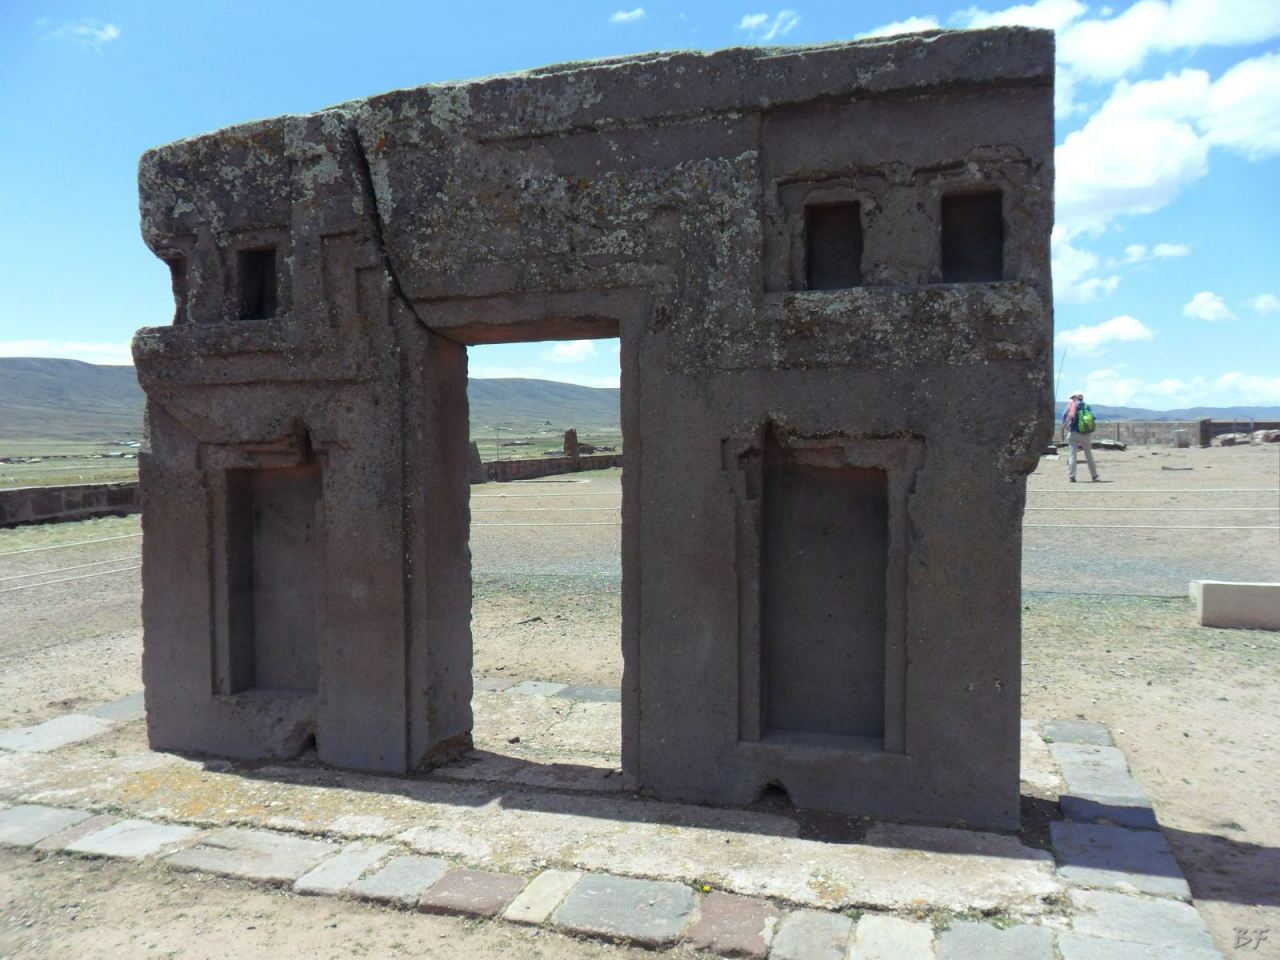 Sito-Megalitico-Piramide-Akapana-Kalasasaya-Menhir-Tiahuanaco-Bolivia-21